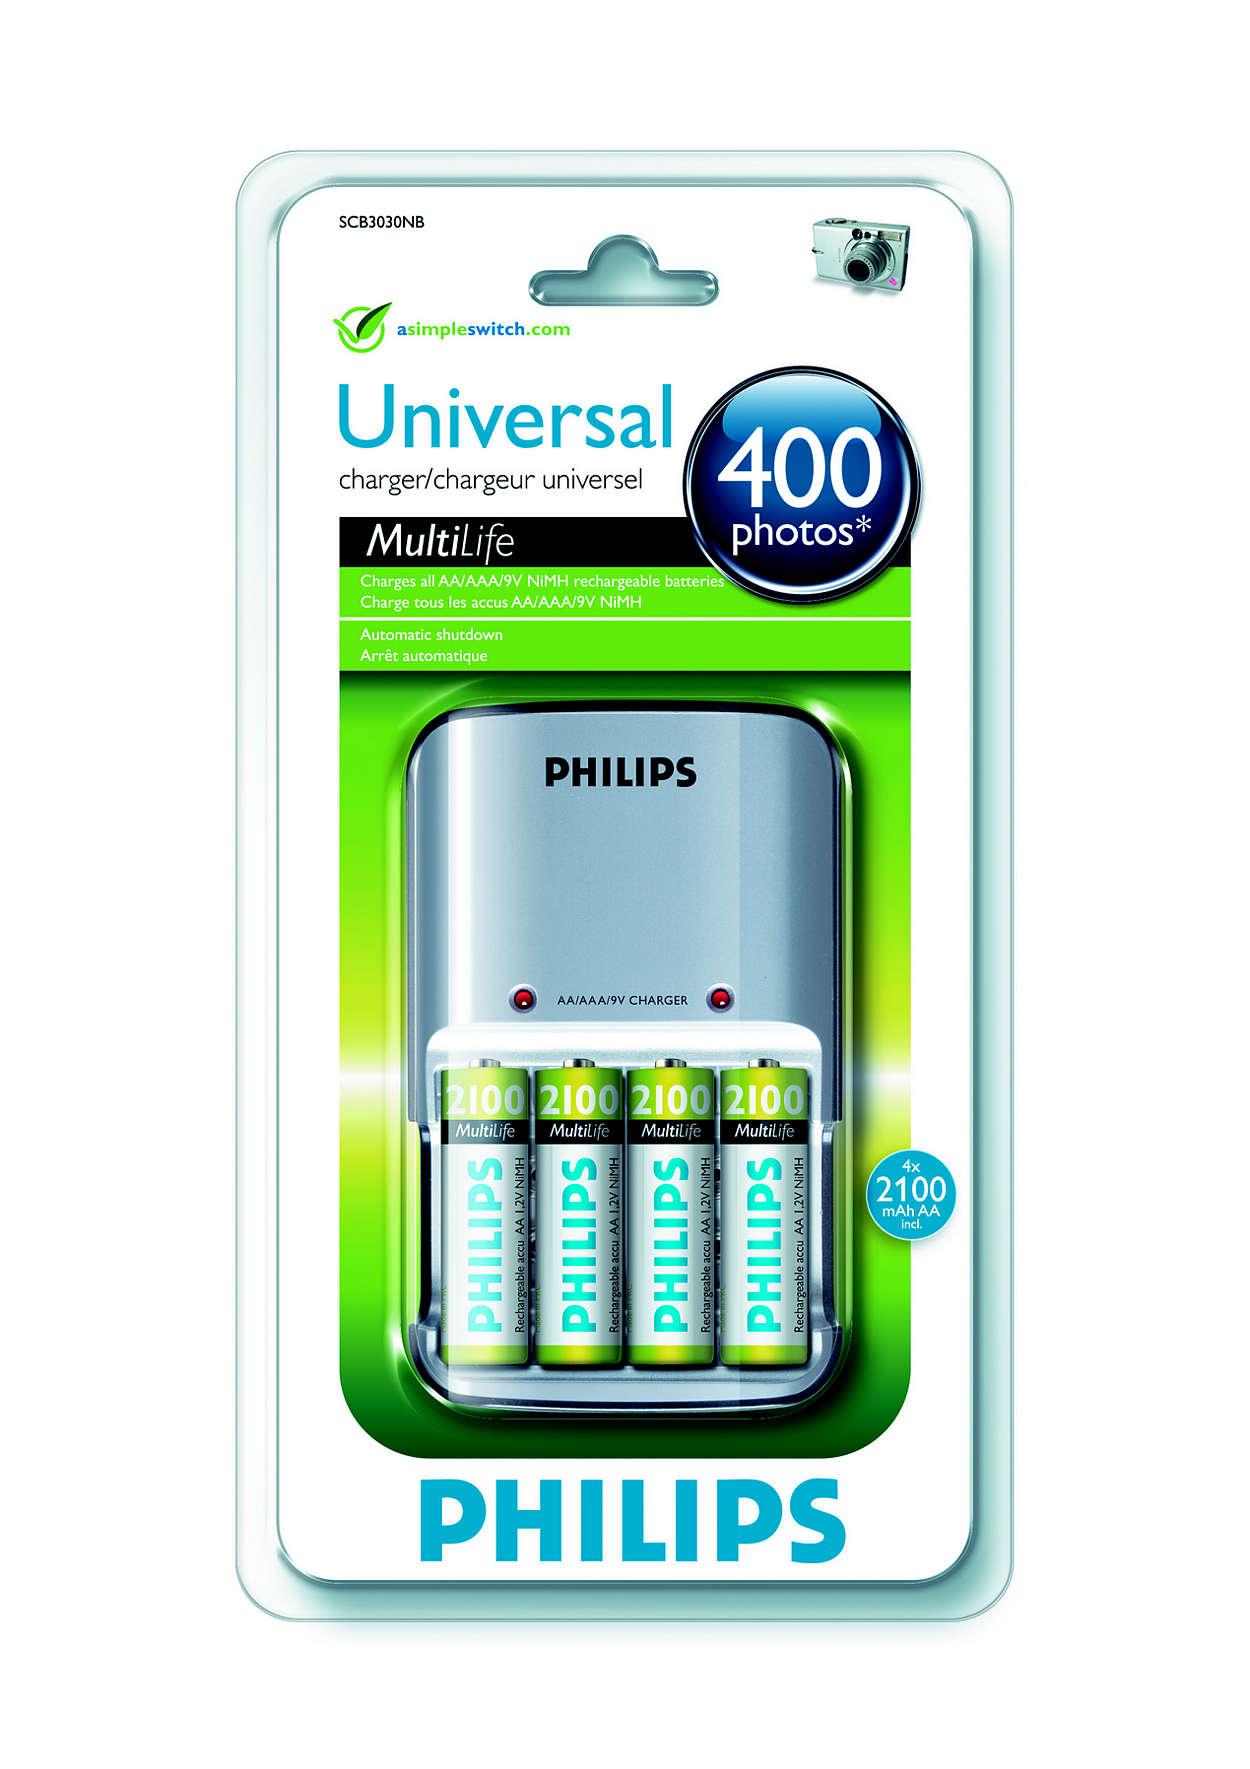 Įkrauna visas AA/AAA/9 V NiMH įkraunamas baterijas